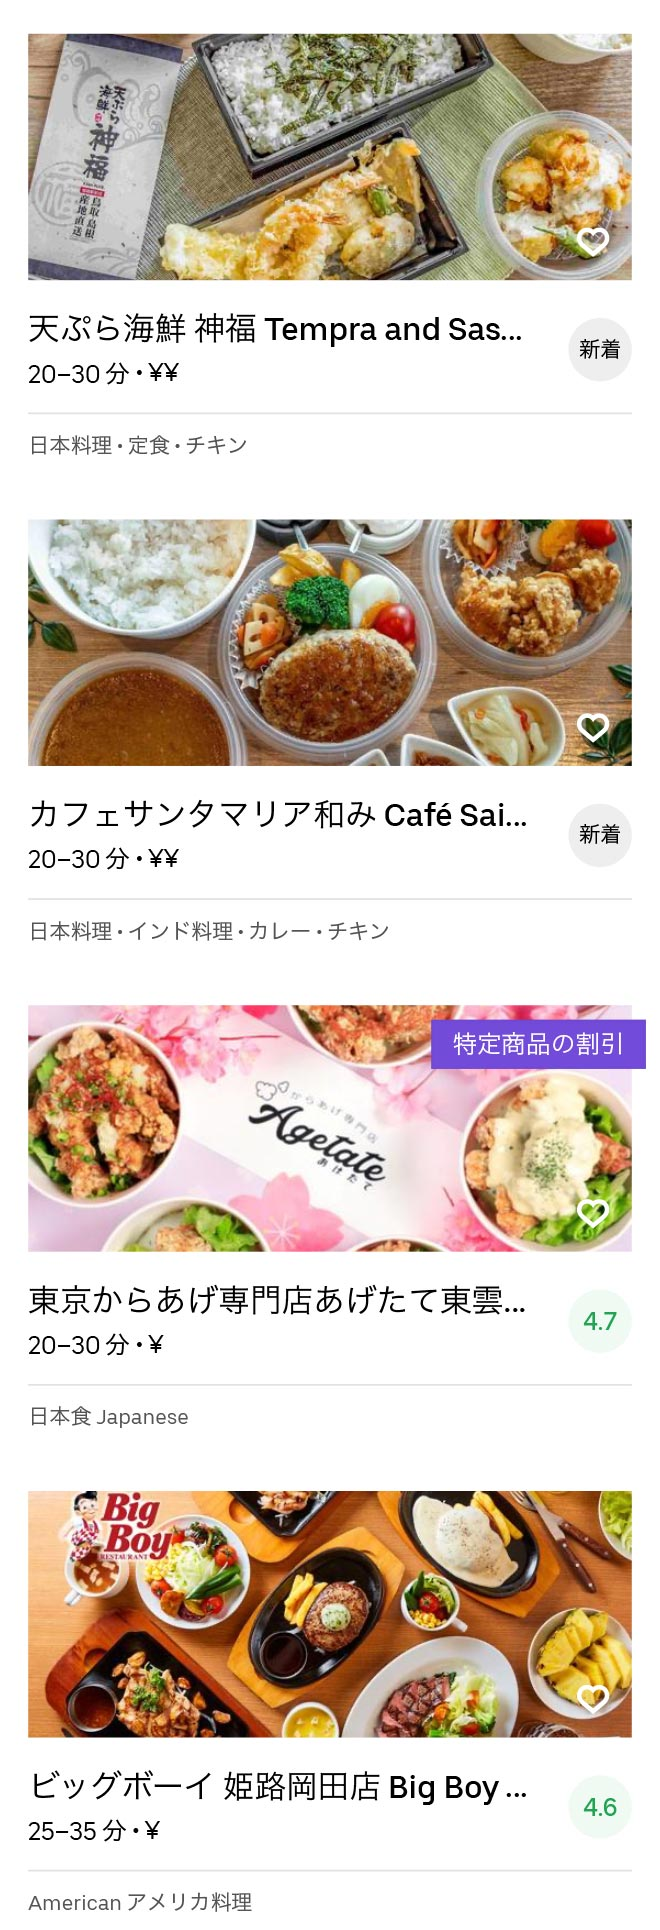 Himeji menu 2007 05